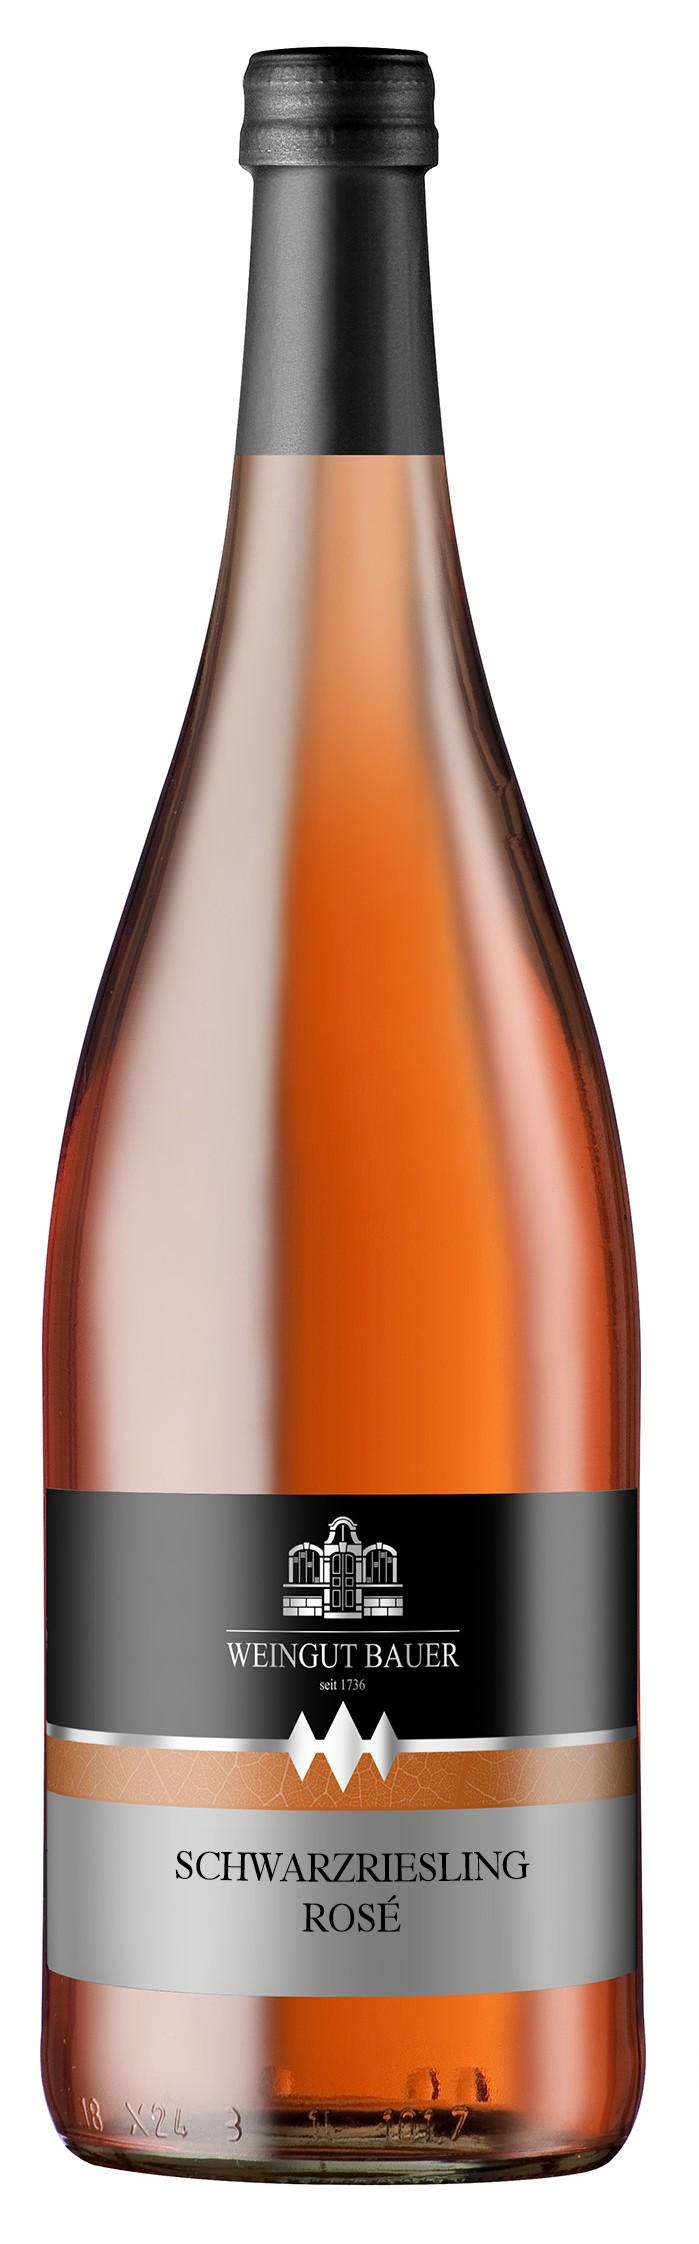 2015 Schwarzriesling Rosé 1000ml